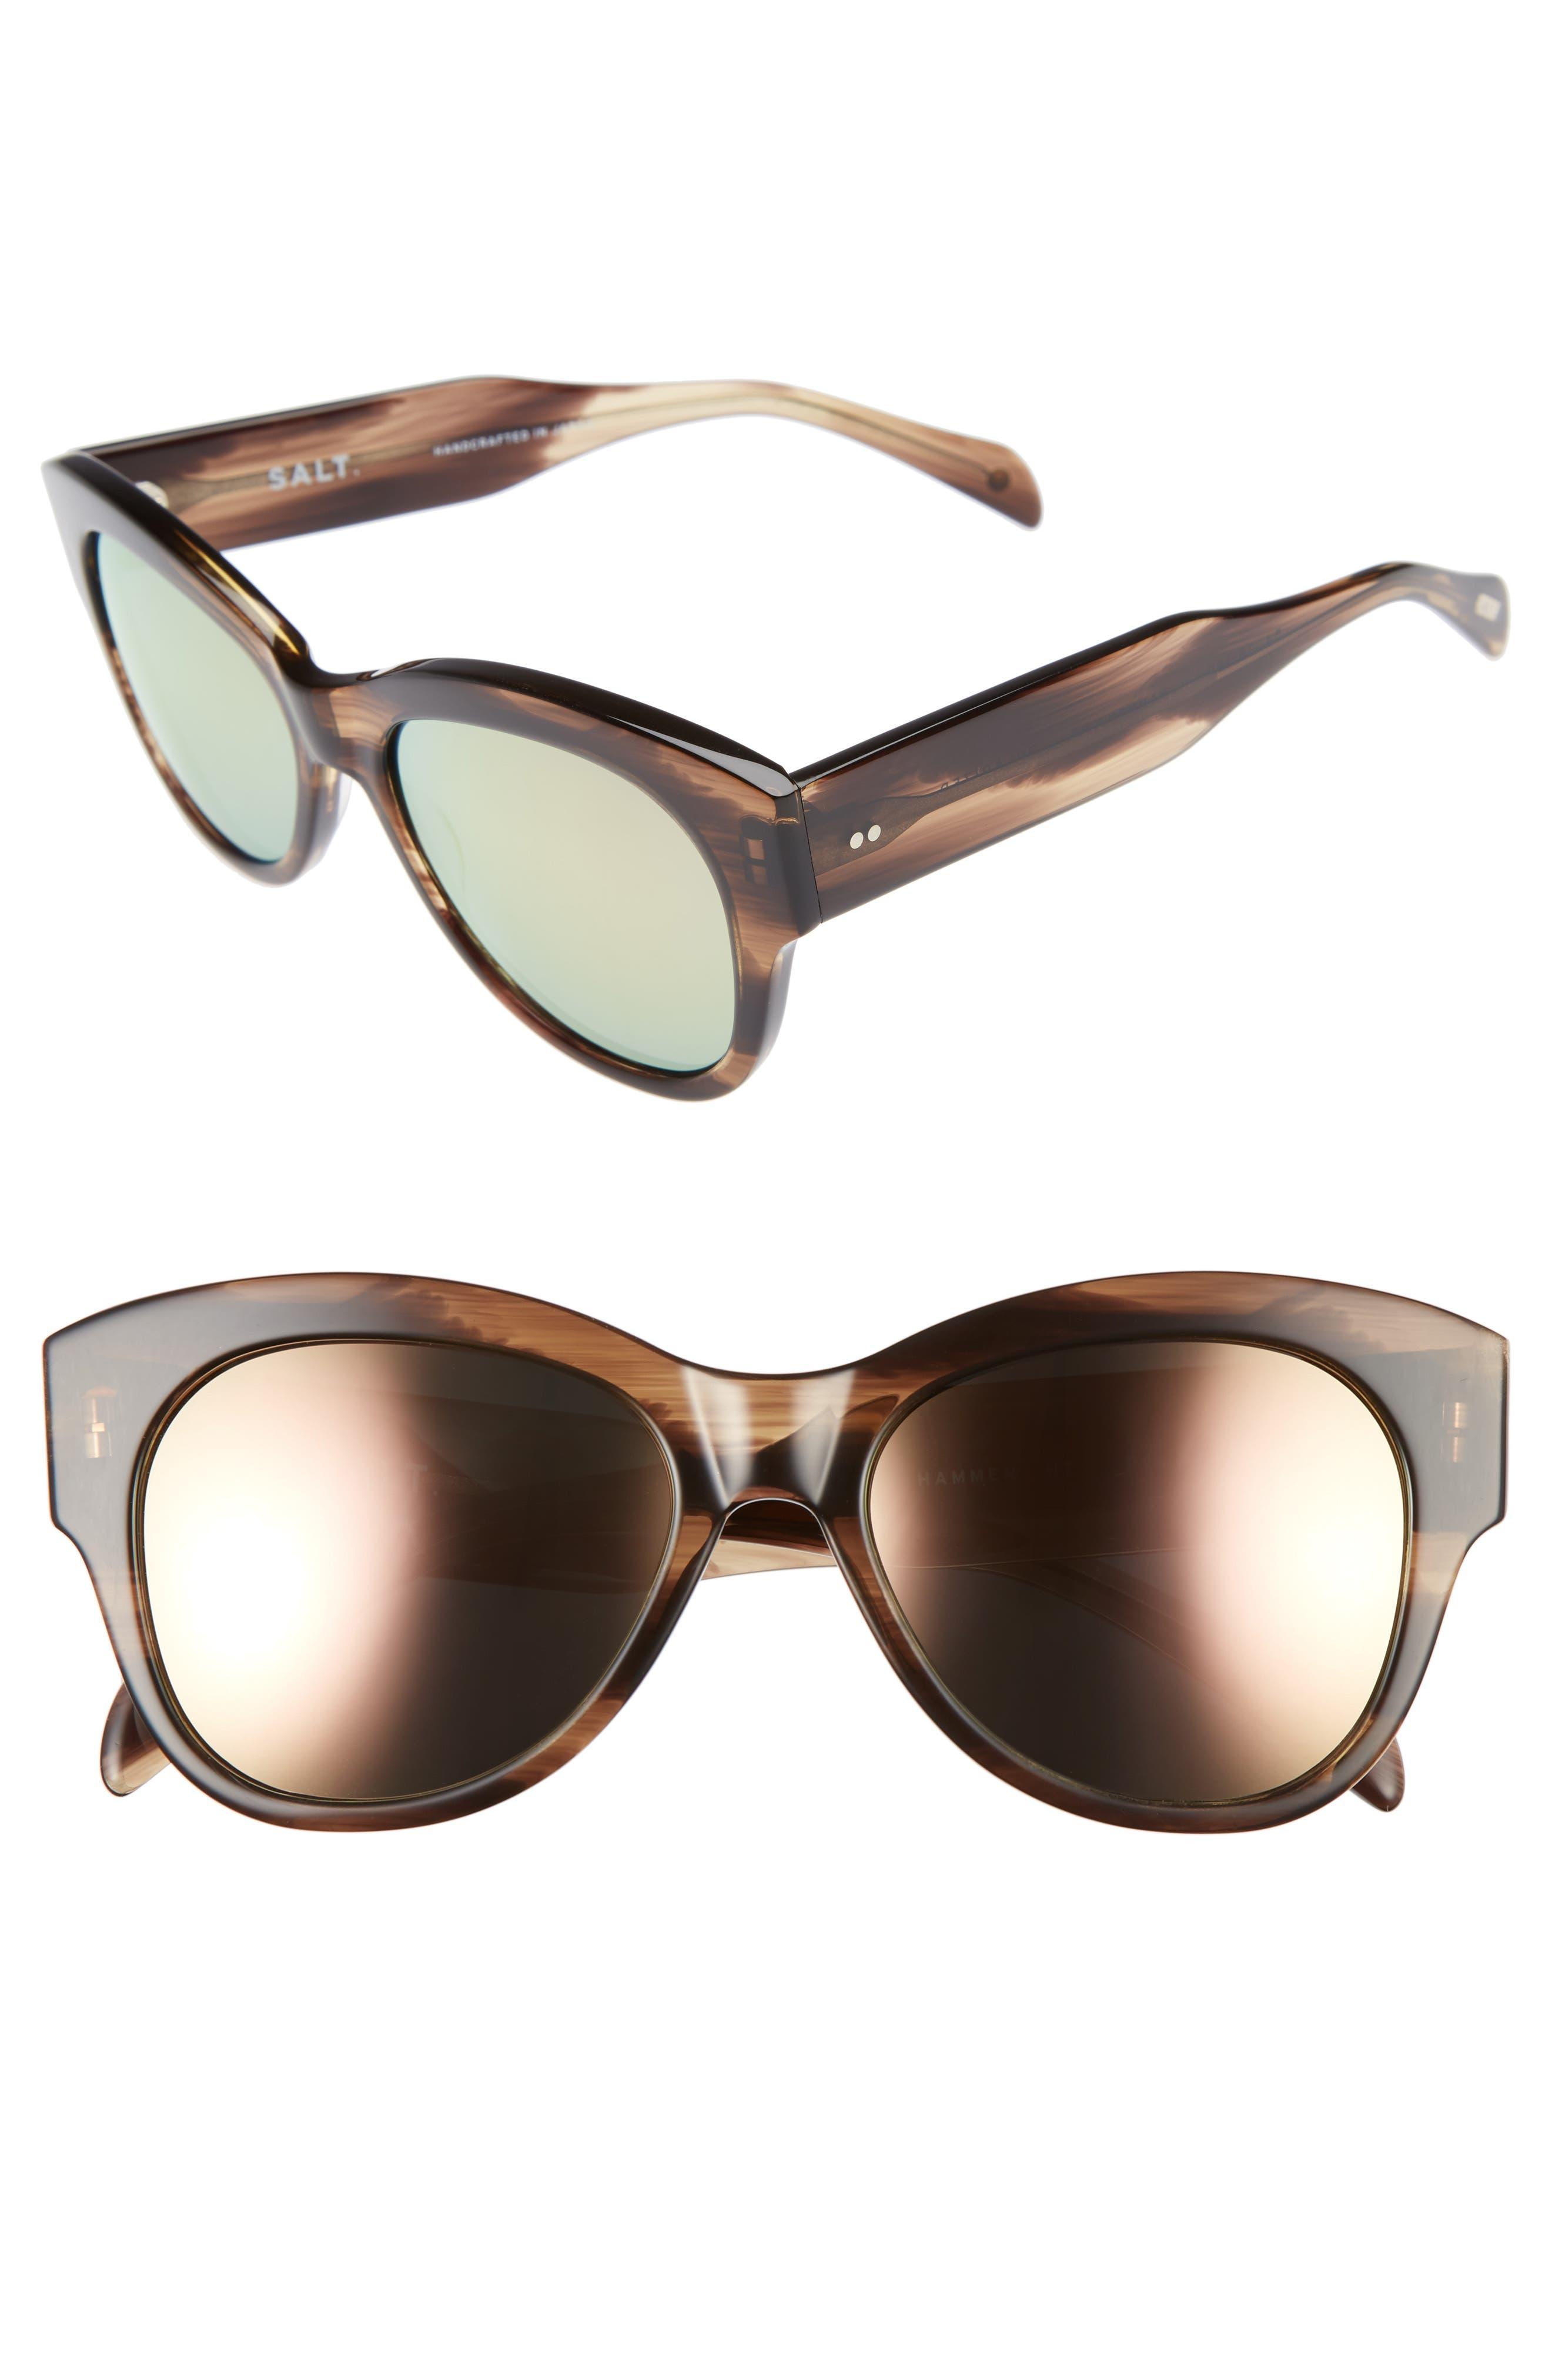 Hammen 54mm Polarized Cat Eye Sunglasses,                             Main thumbnail 1, color,                             Hazy Taupe/ Rose Mirror